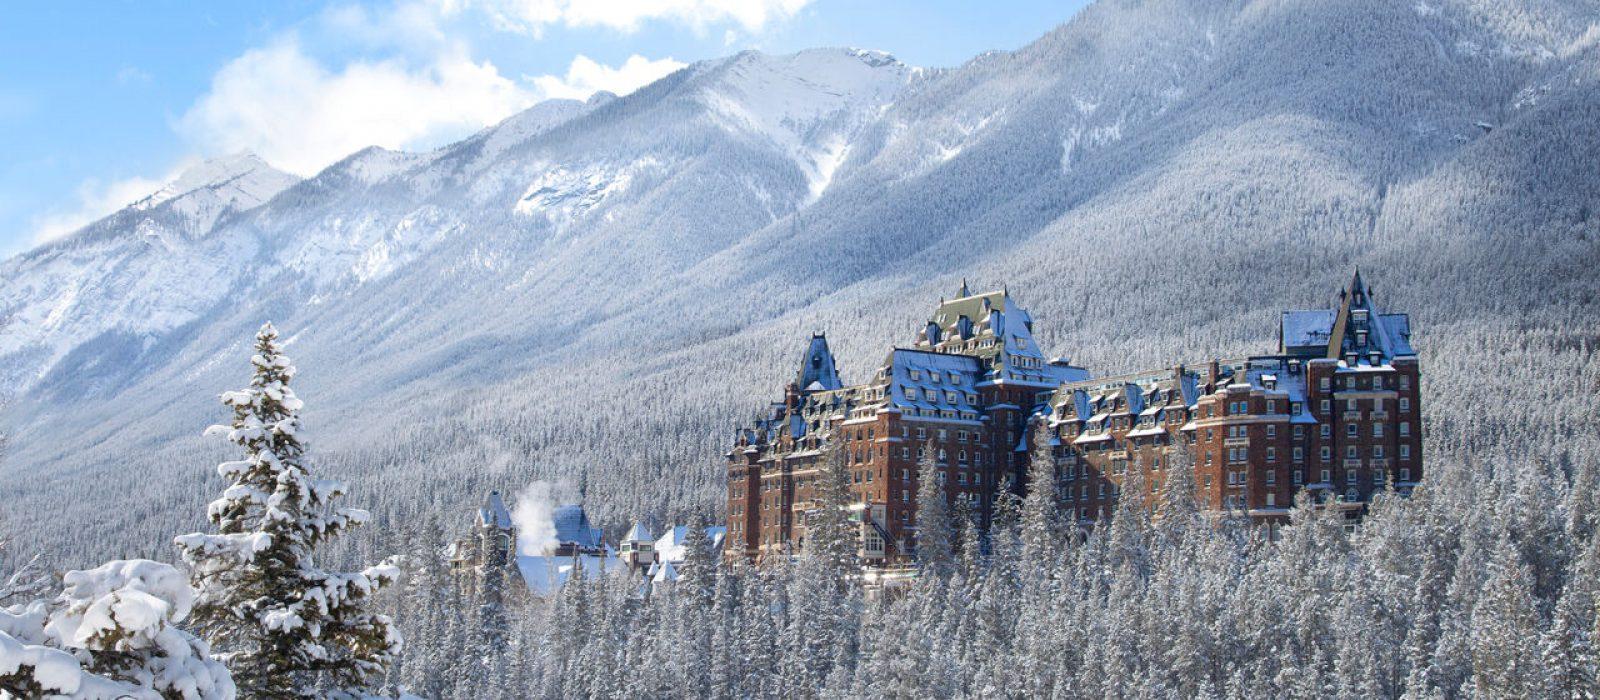 Destination_Accommodation_Winter_BanffSpringsHotel_Credit_Fairmont Resort Hotels